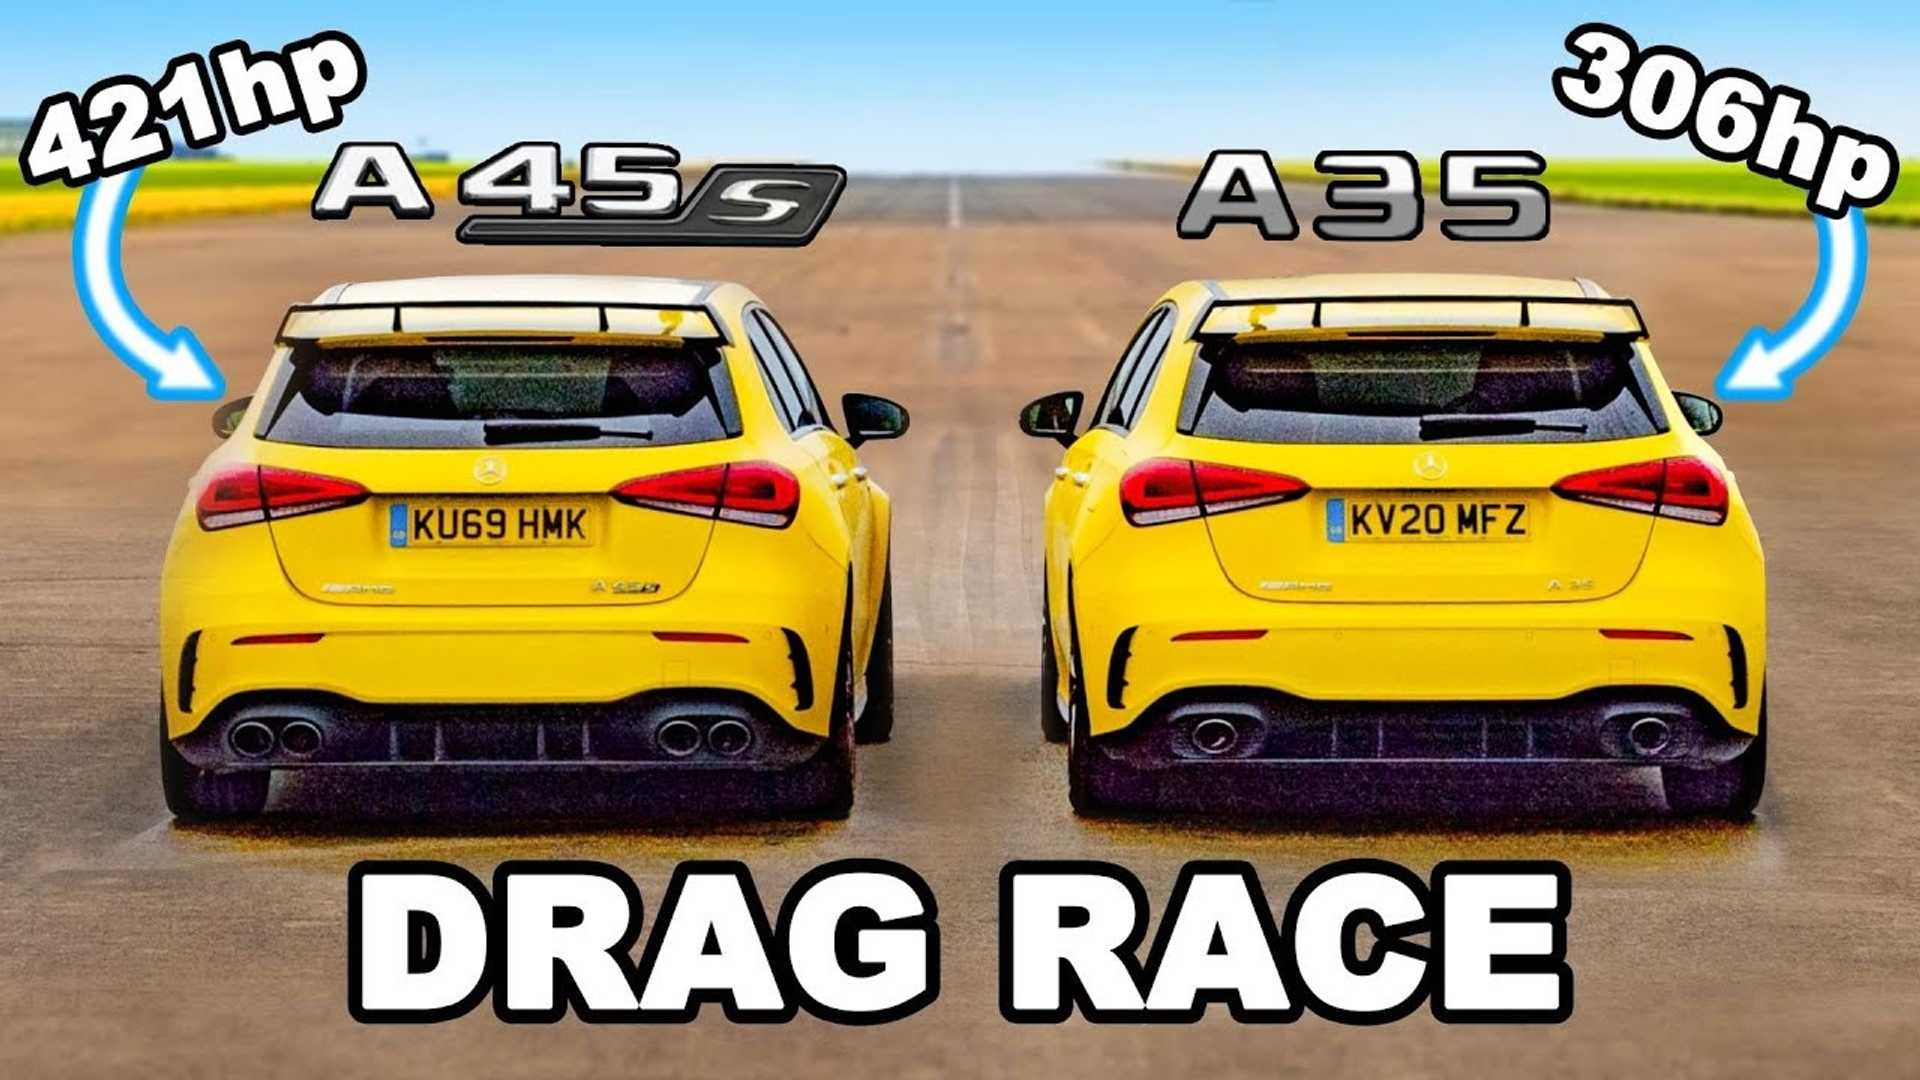 Mercedes-AMG A35 Drag Races A45 S In Hot Versus Hotter Hatchback